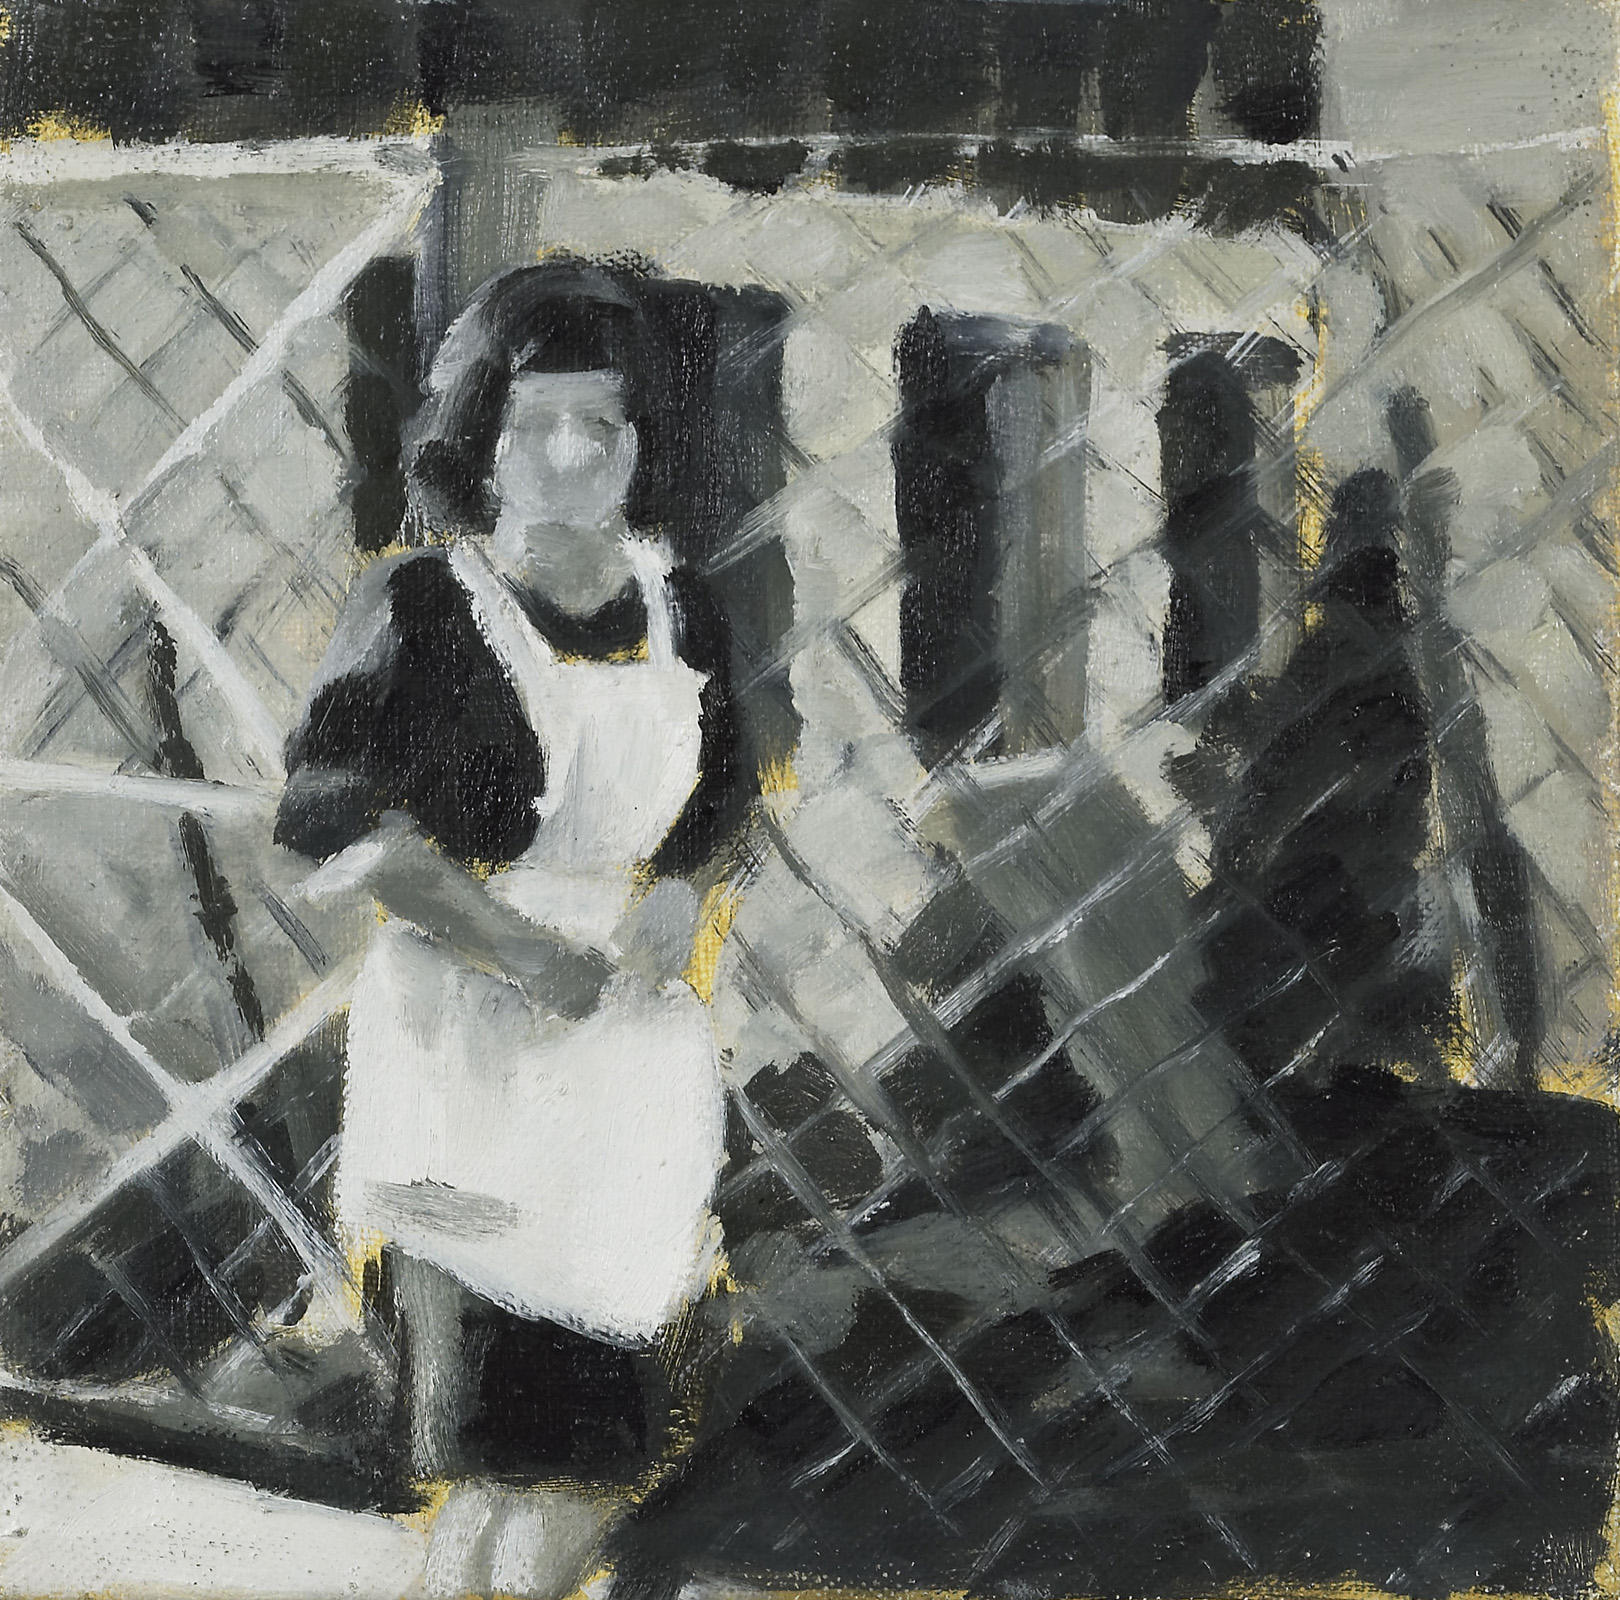 """Erna, 1963"", Öl auf Nessel, 20x20 cm, 2002"